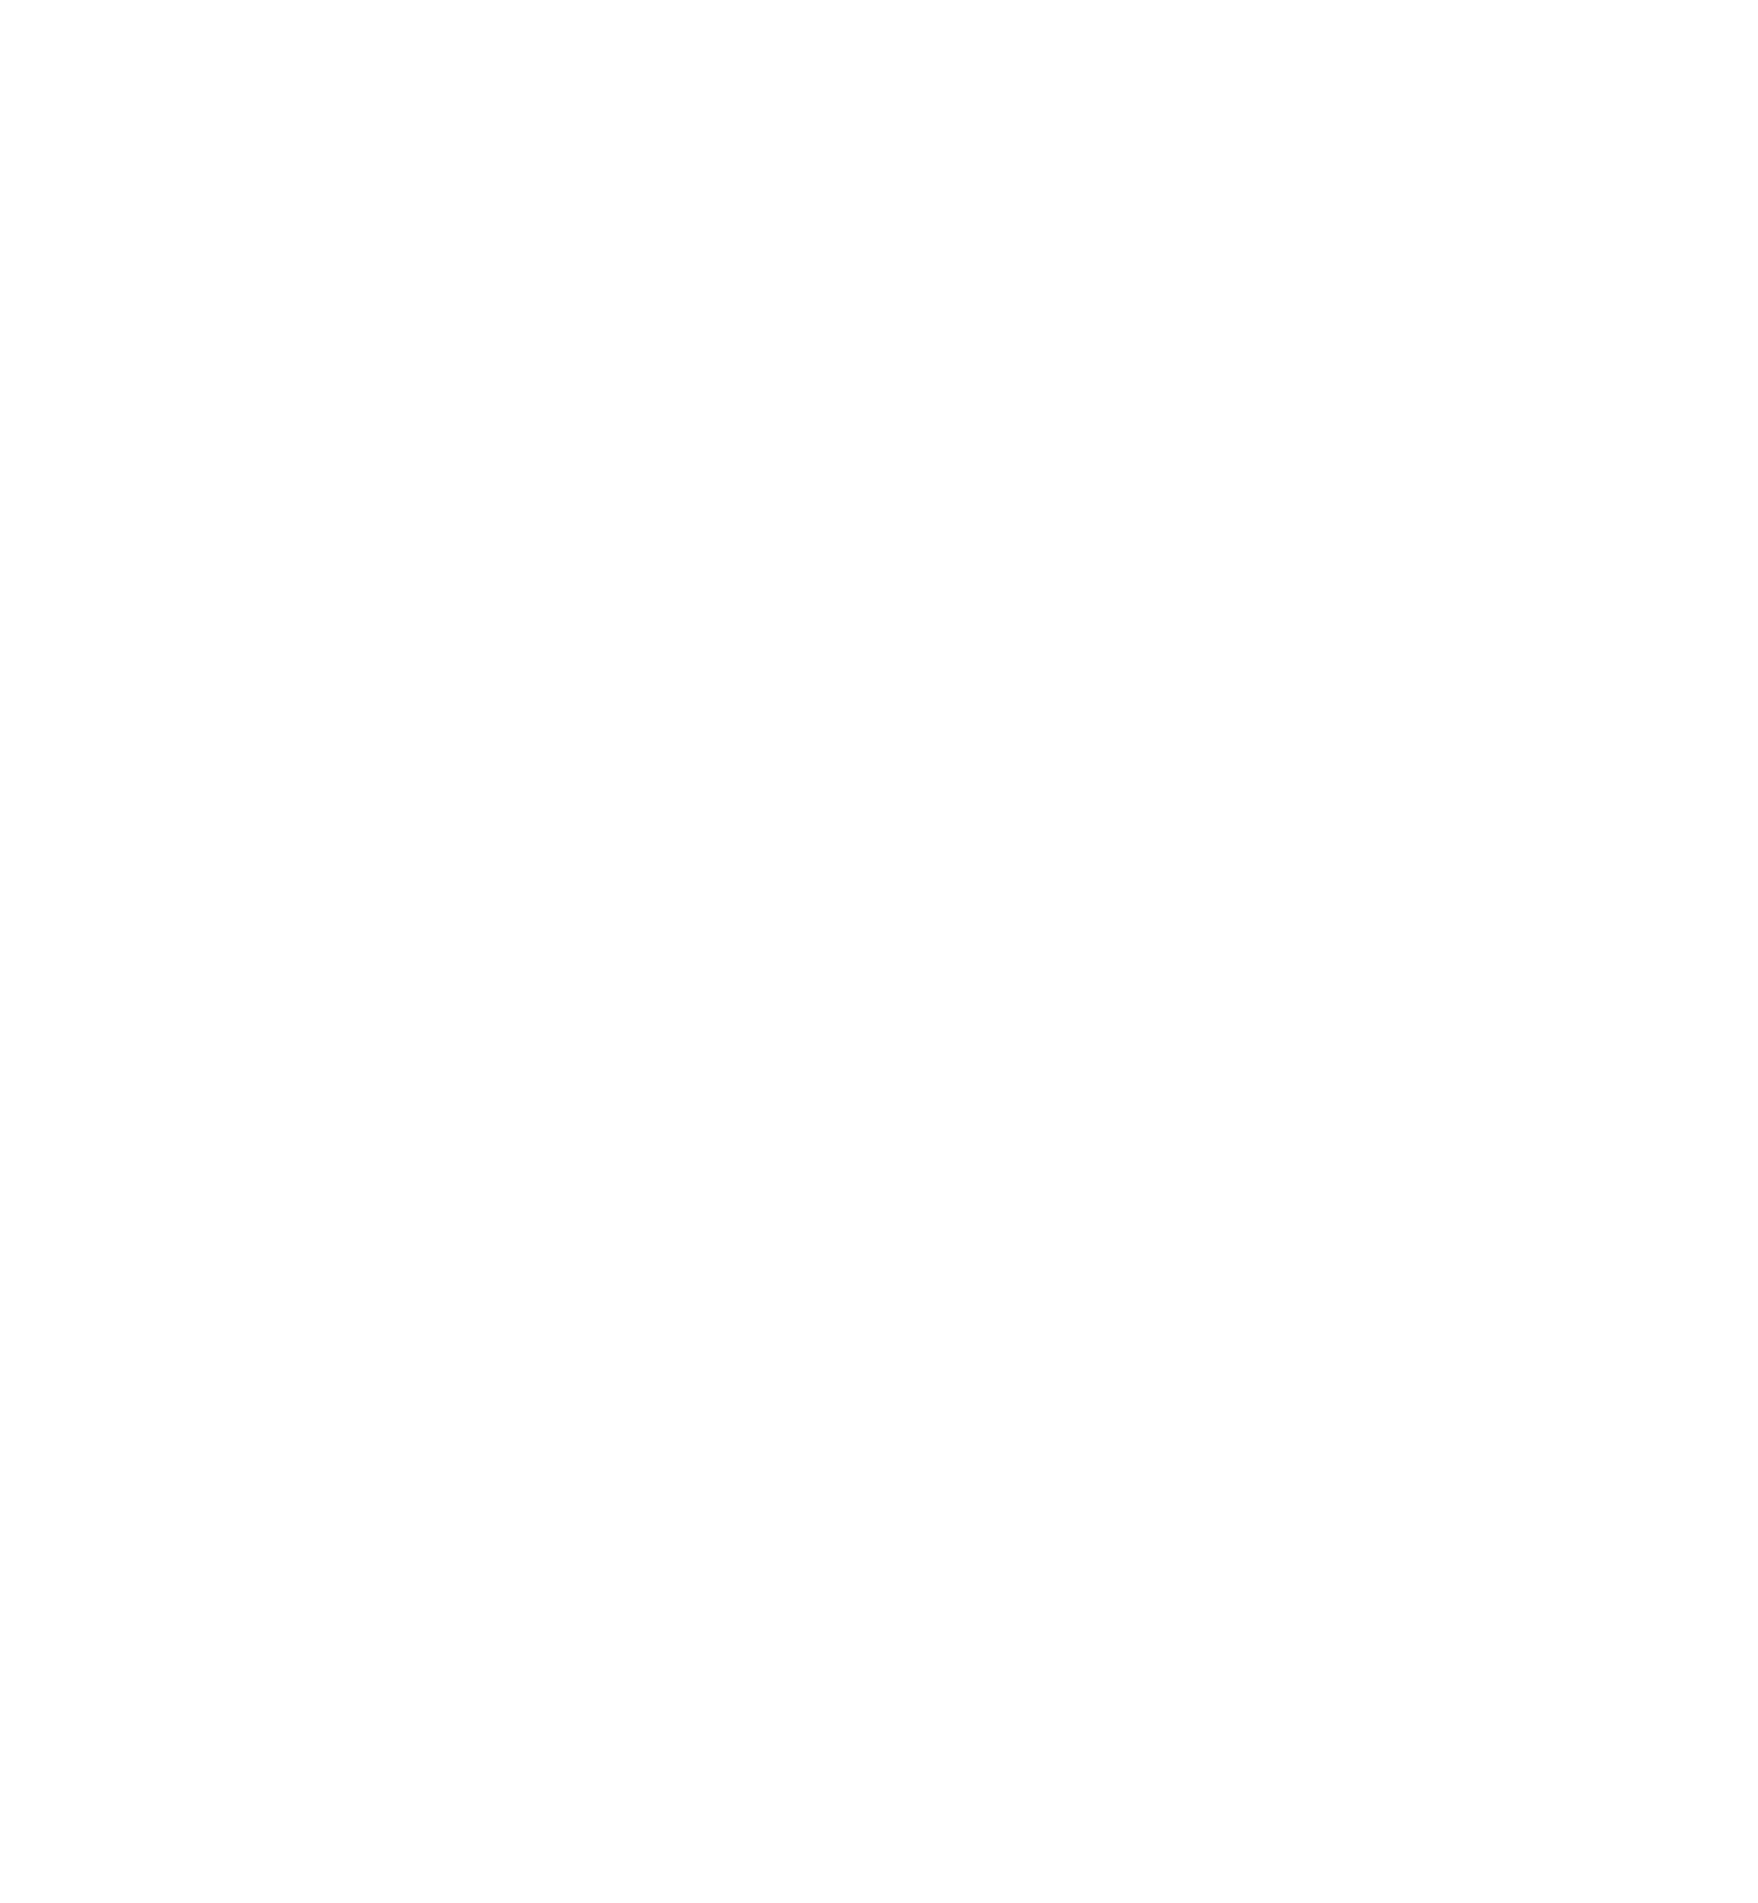 Sābu Ramen | Japanese Ramen & Street Food in Lakeland, FL